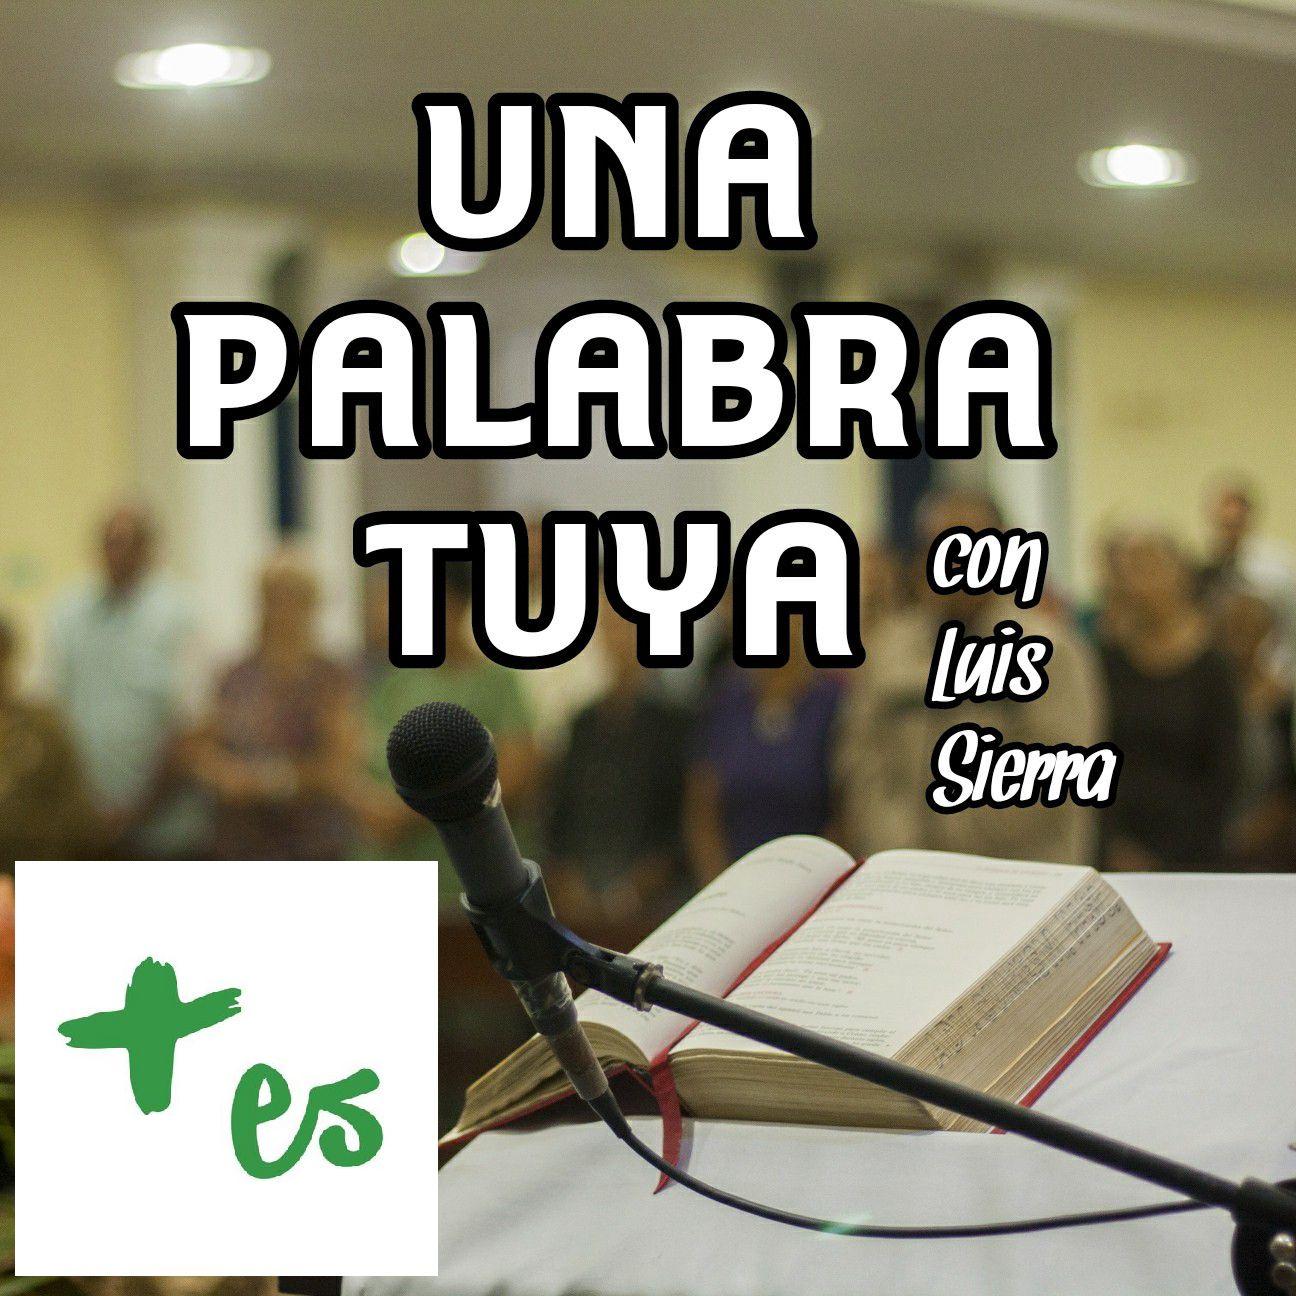 Una Palabra Tuya  | 9 MAY 2019